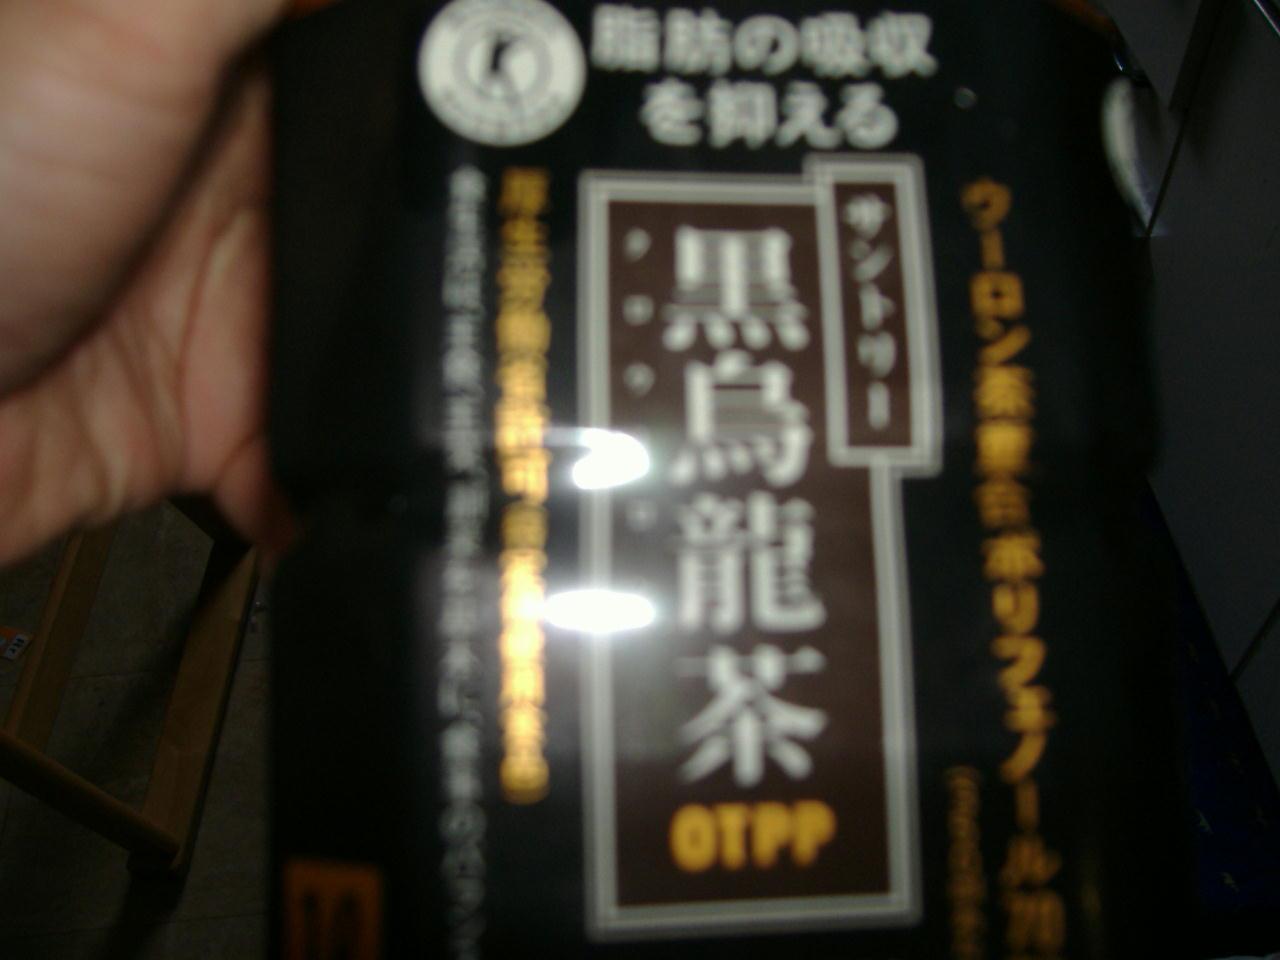 PHOTO441.JPG